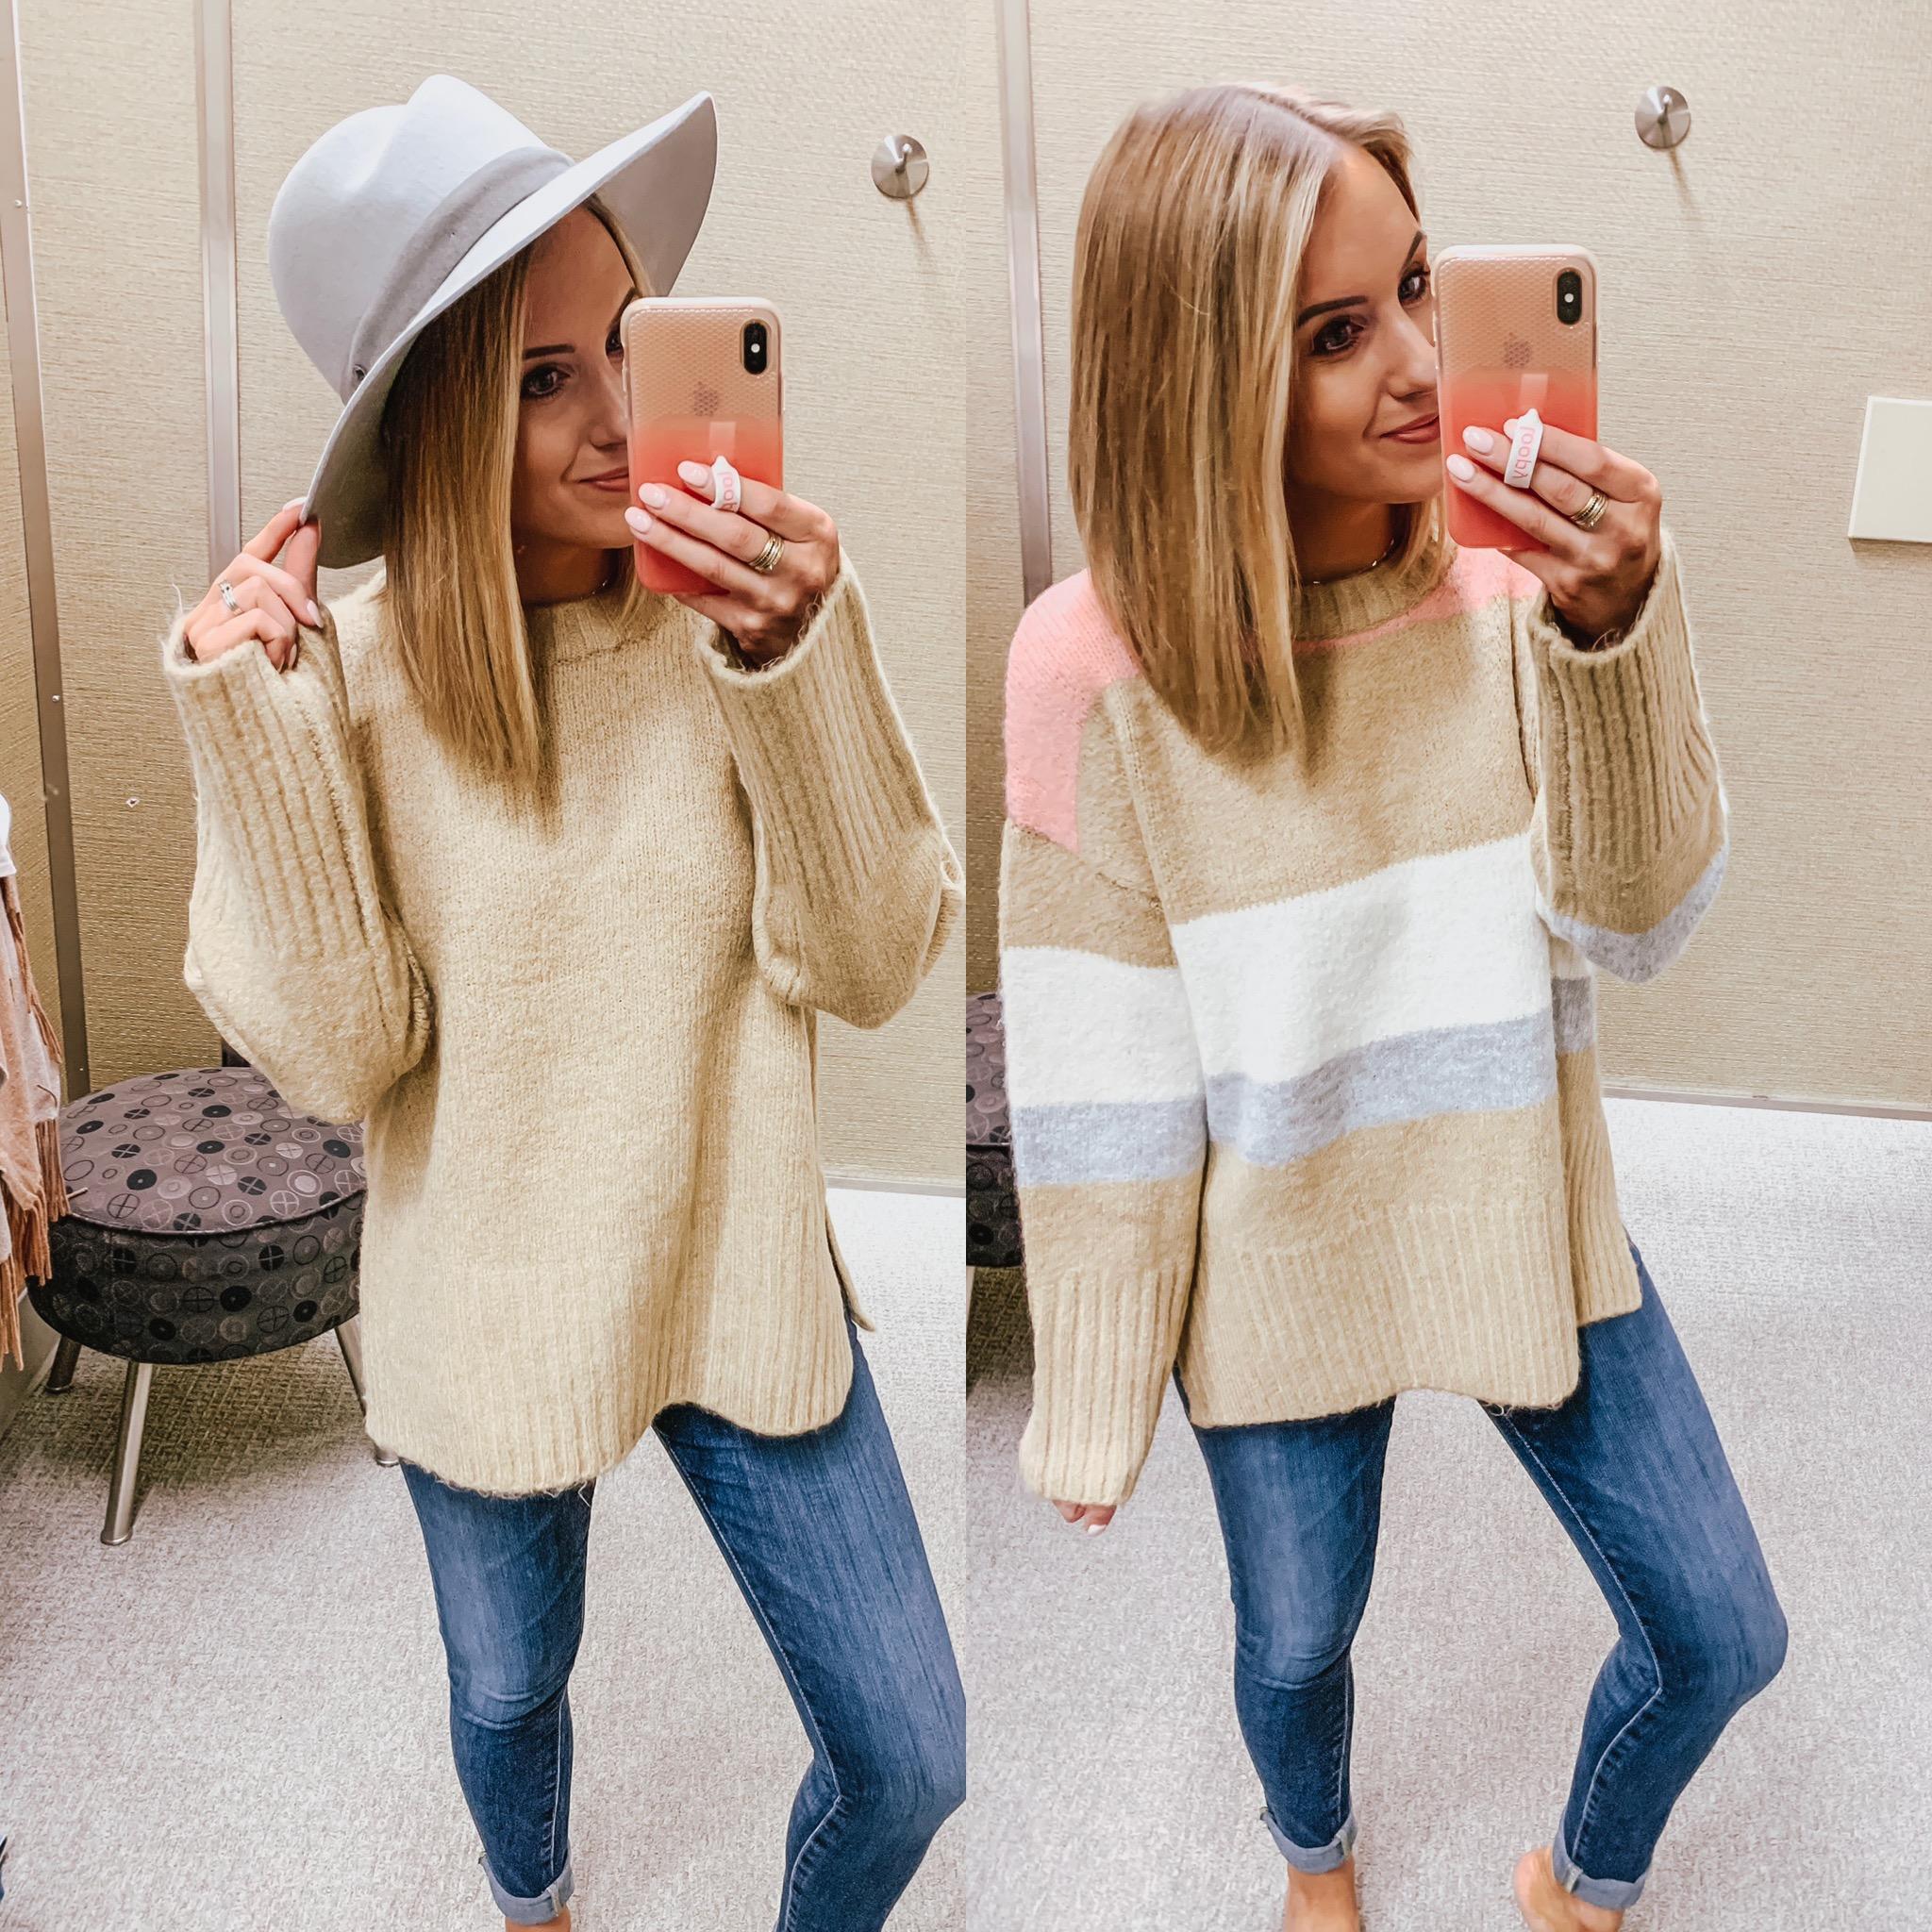 Nordstrom Anniversary Sale Dressing Room Try On! Style Blogger Lauren Meyer shares a Nordstrom Anniversary Sale Dressing Room Try On